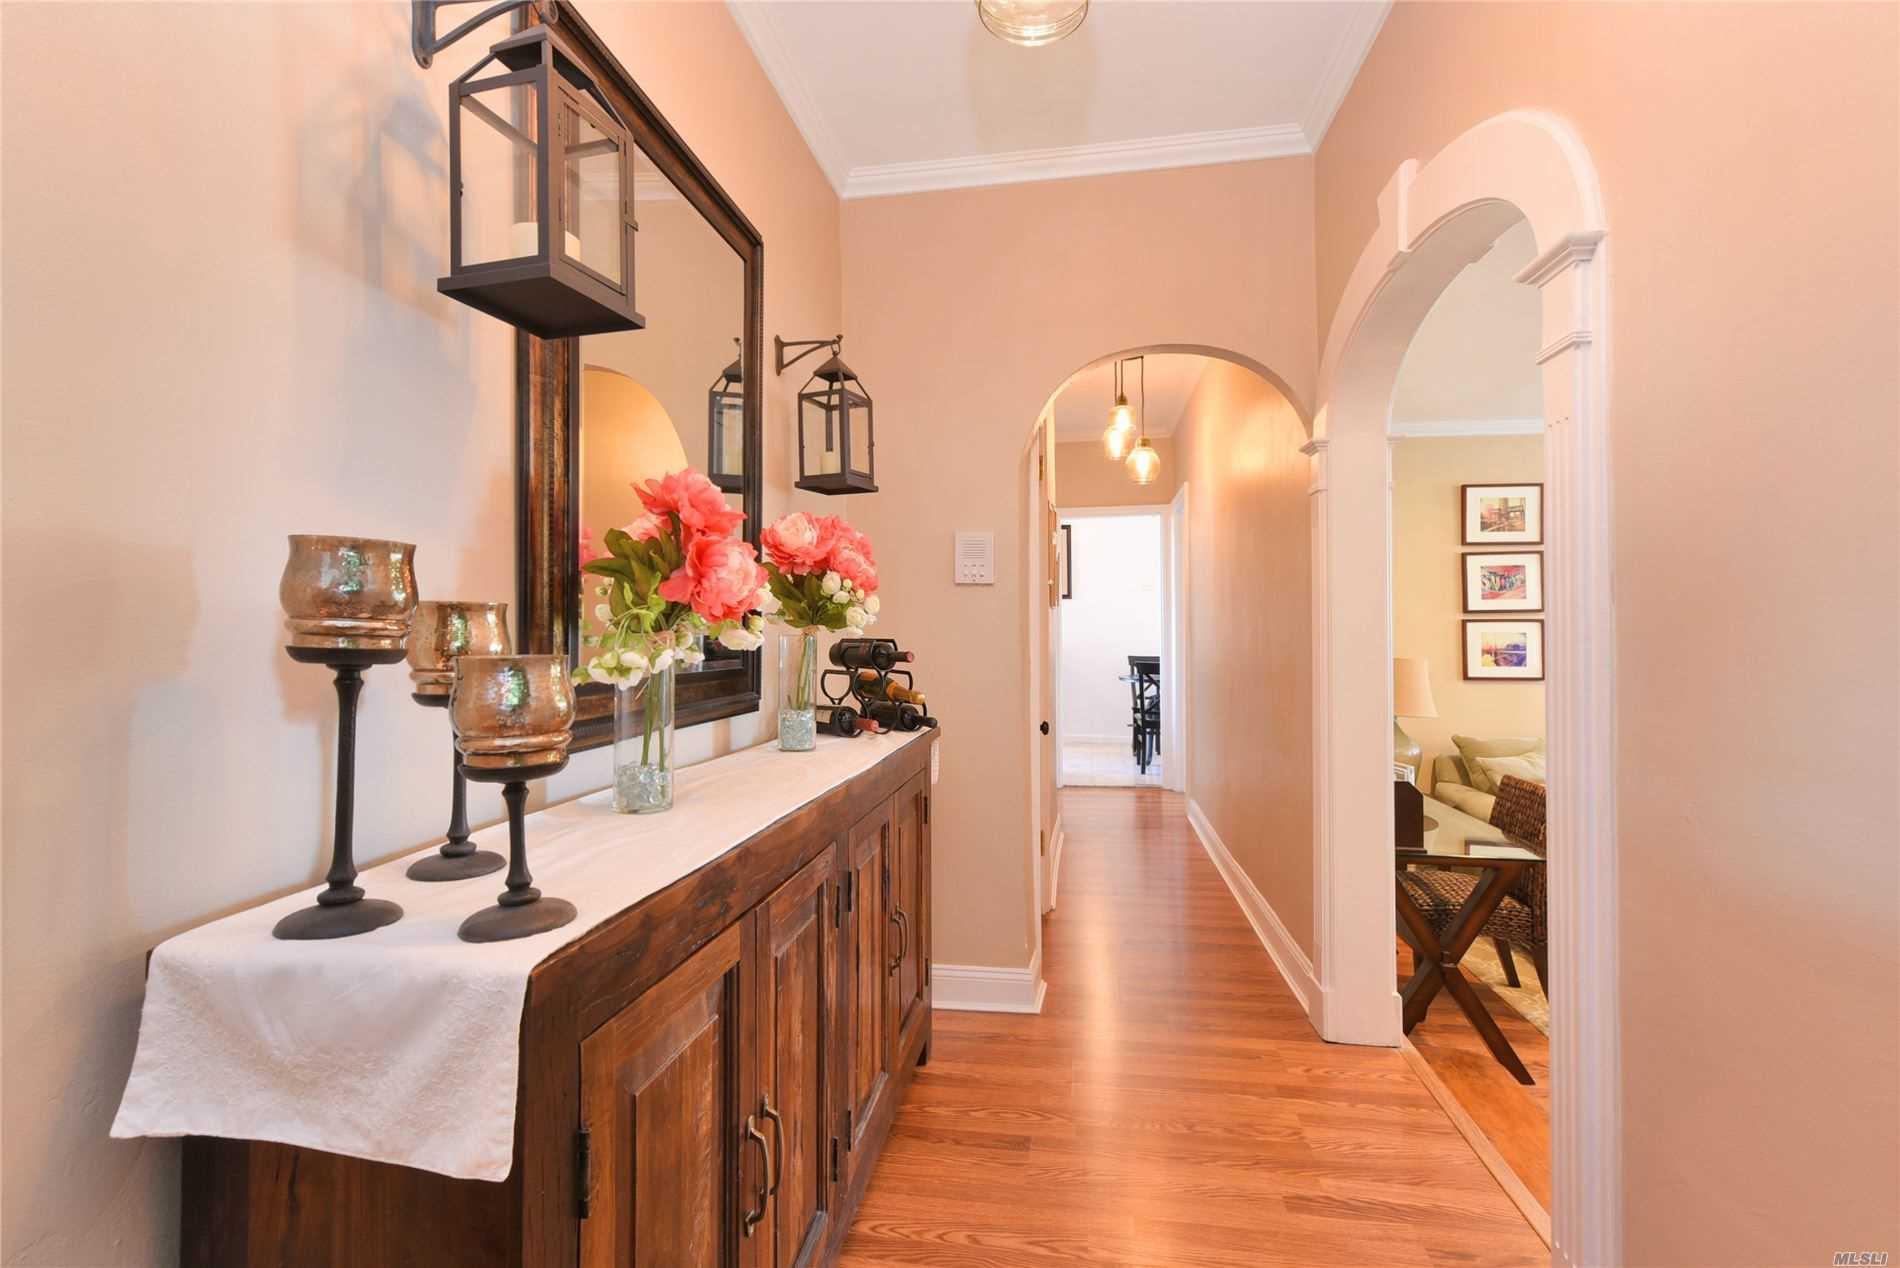 Property for sale at 4333 48th Street # 5G, Sunnyside NY 11104, Sunnyside,  New York 11104